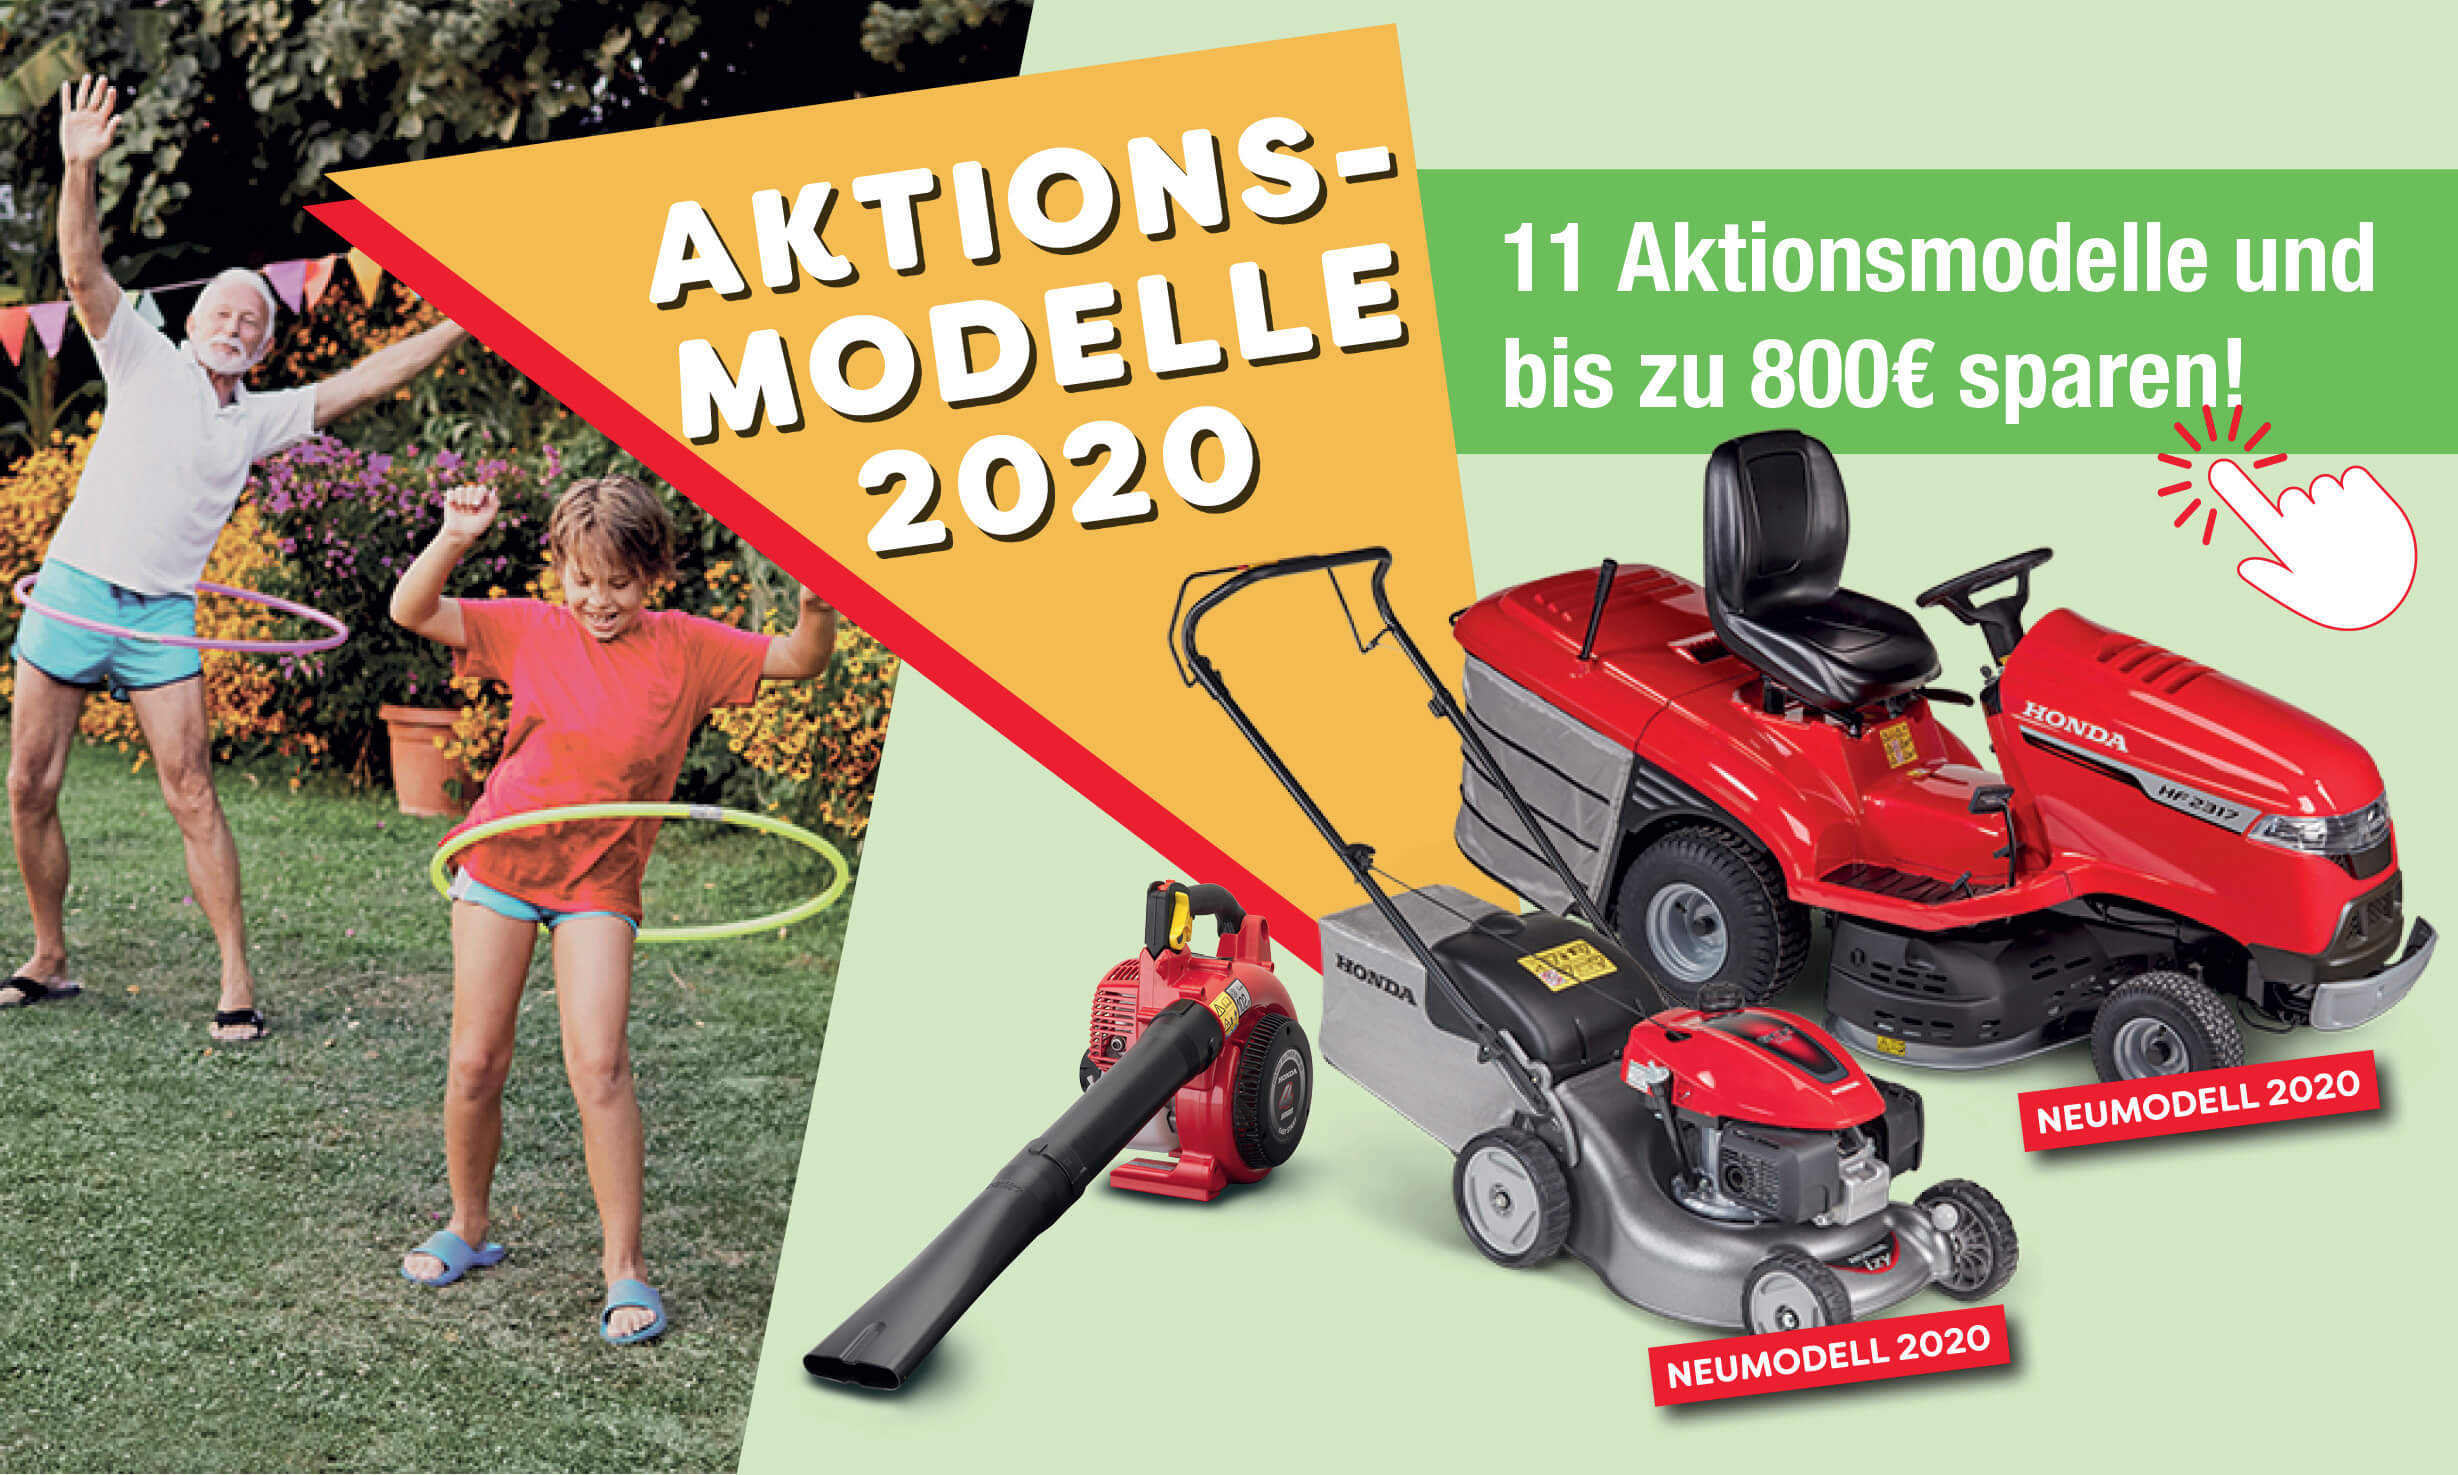 Honda Aktionsmodelle 2020